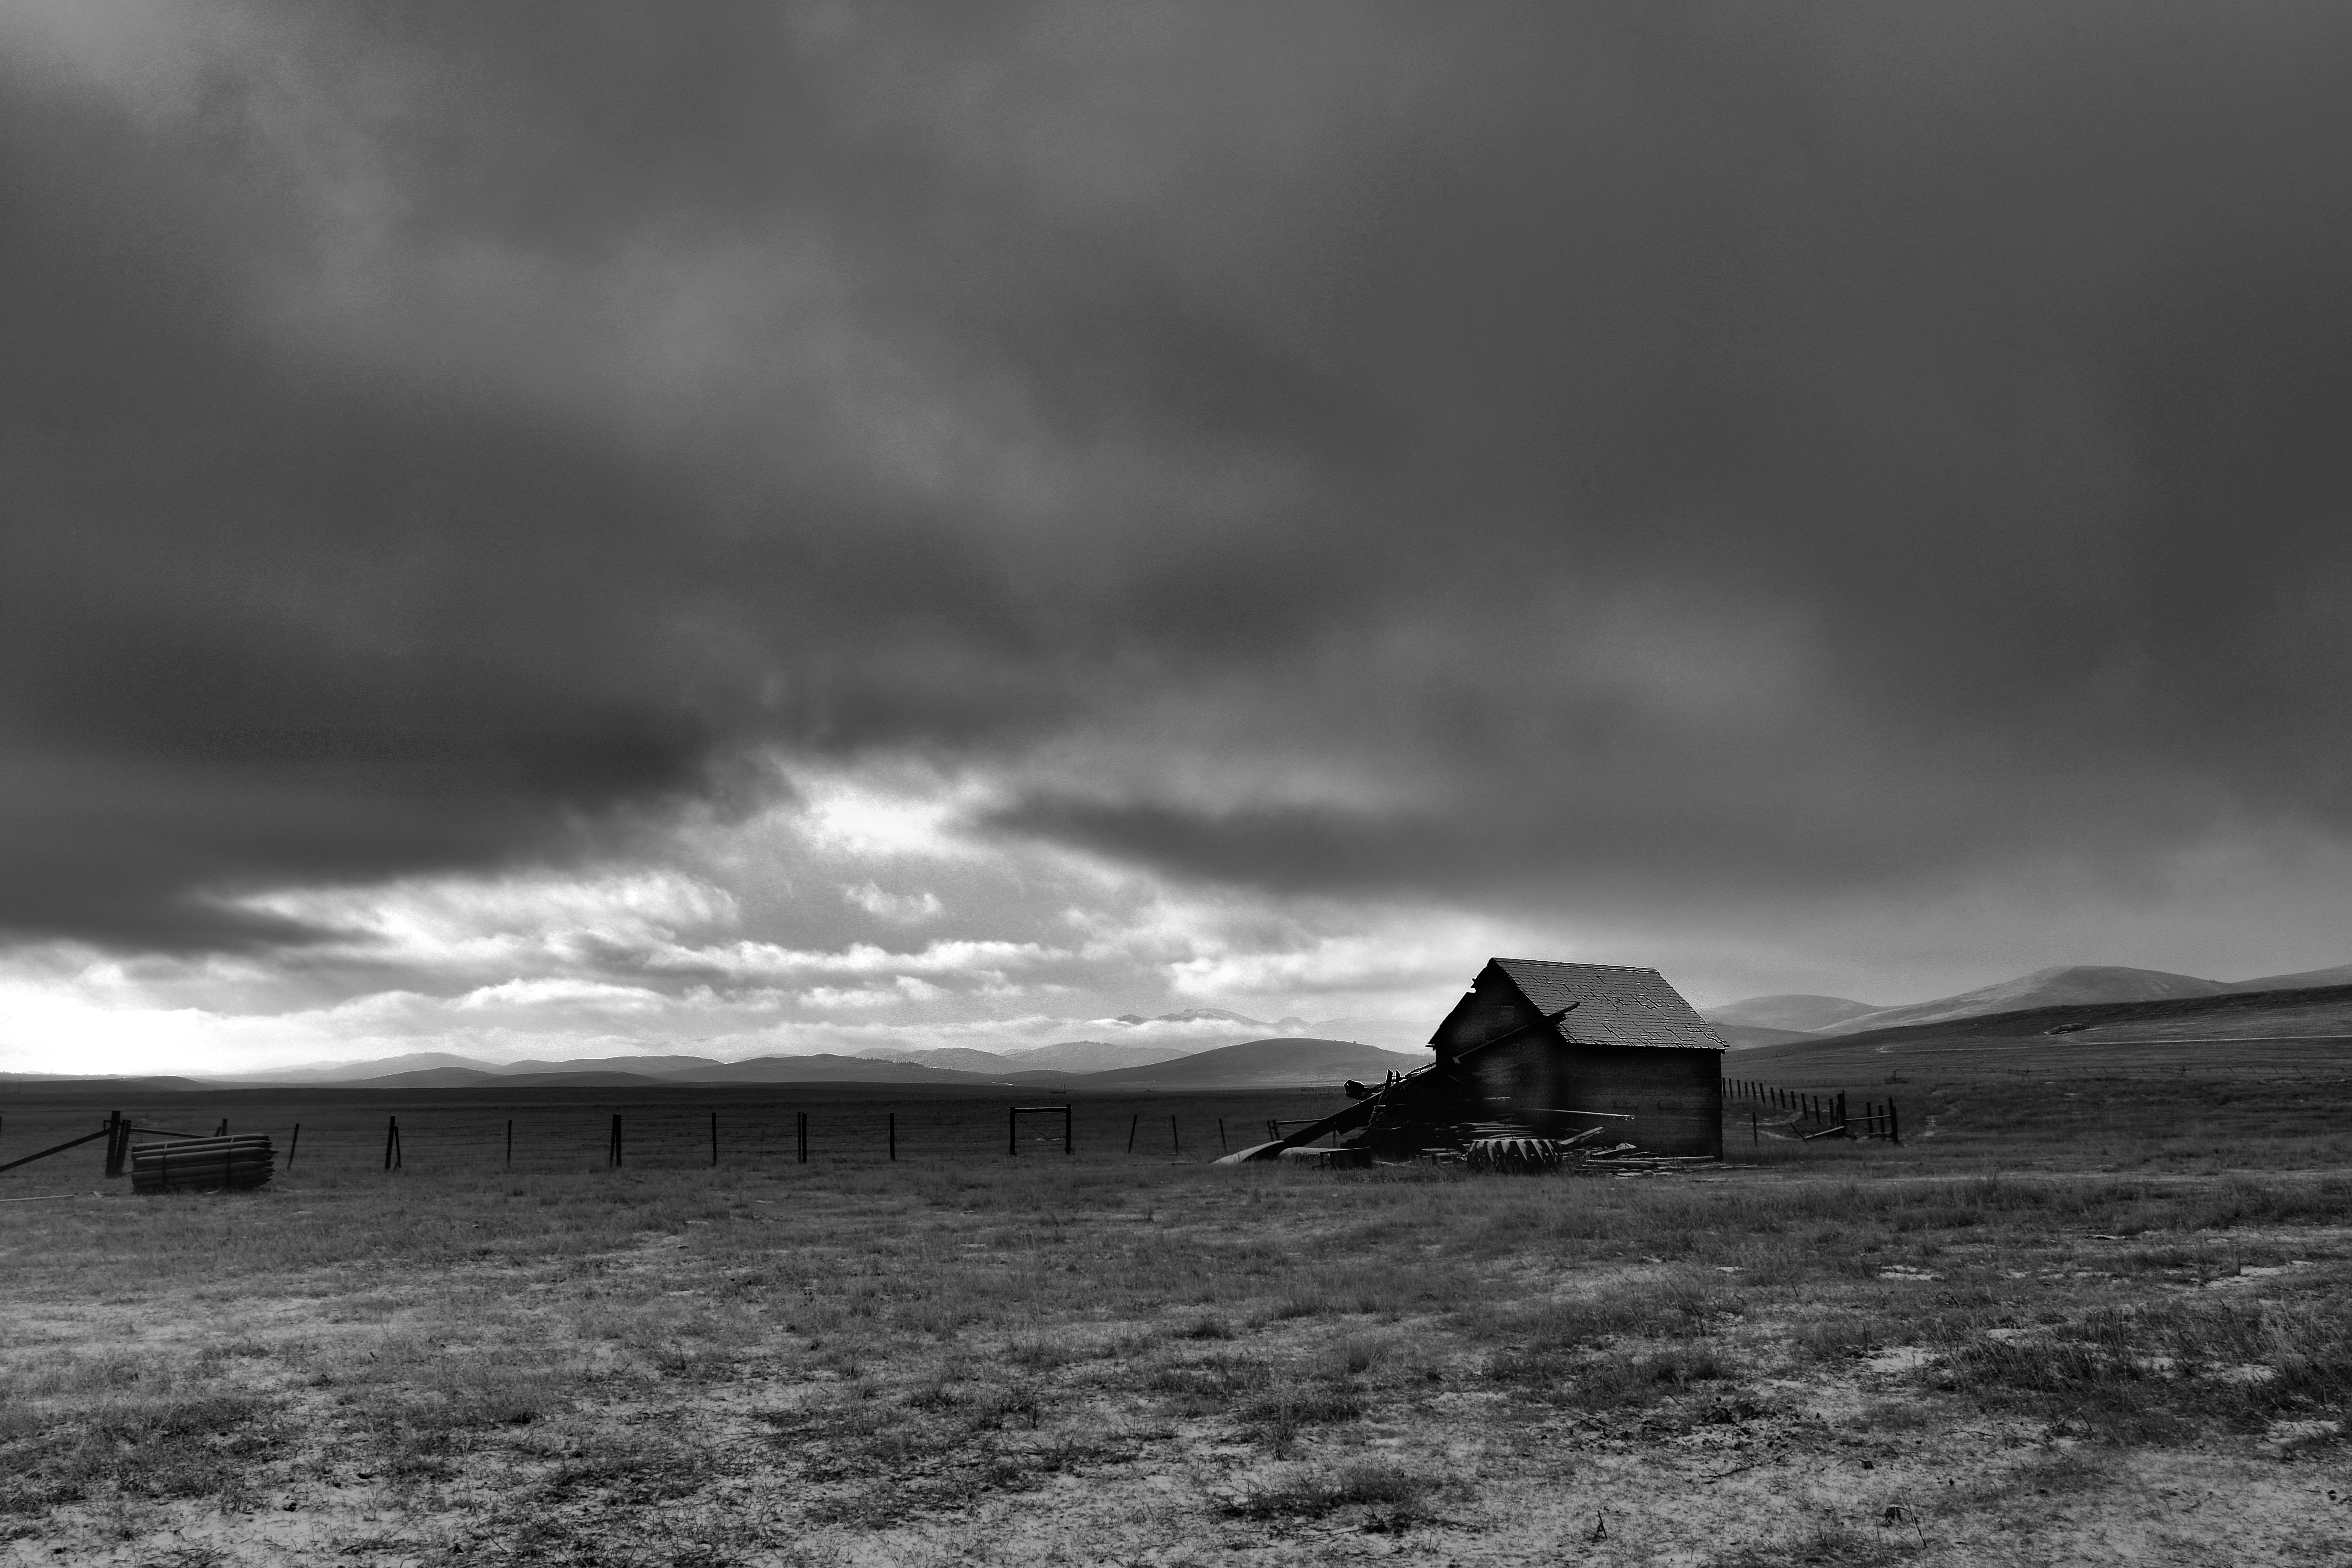 cowboy trail shack clouds bw DSC_0734